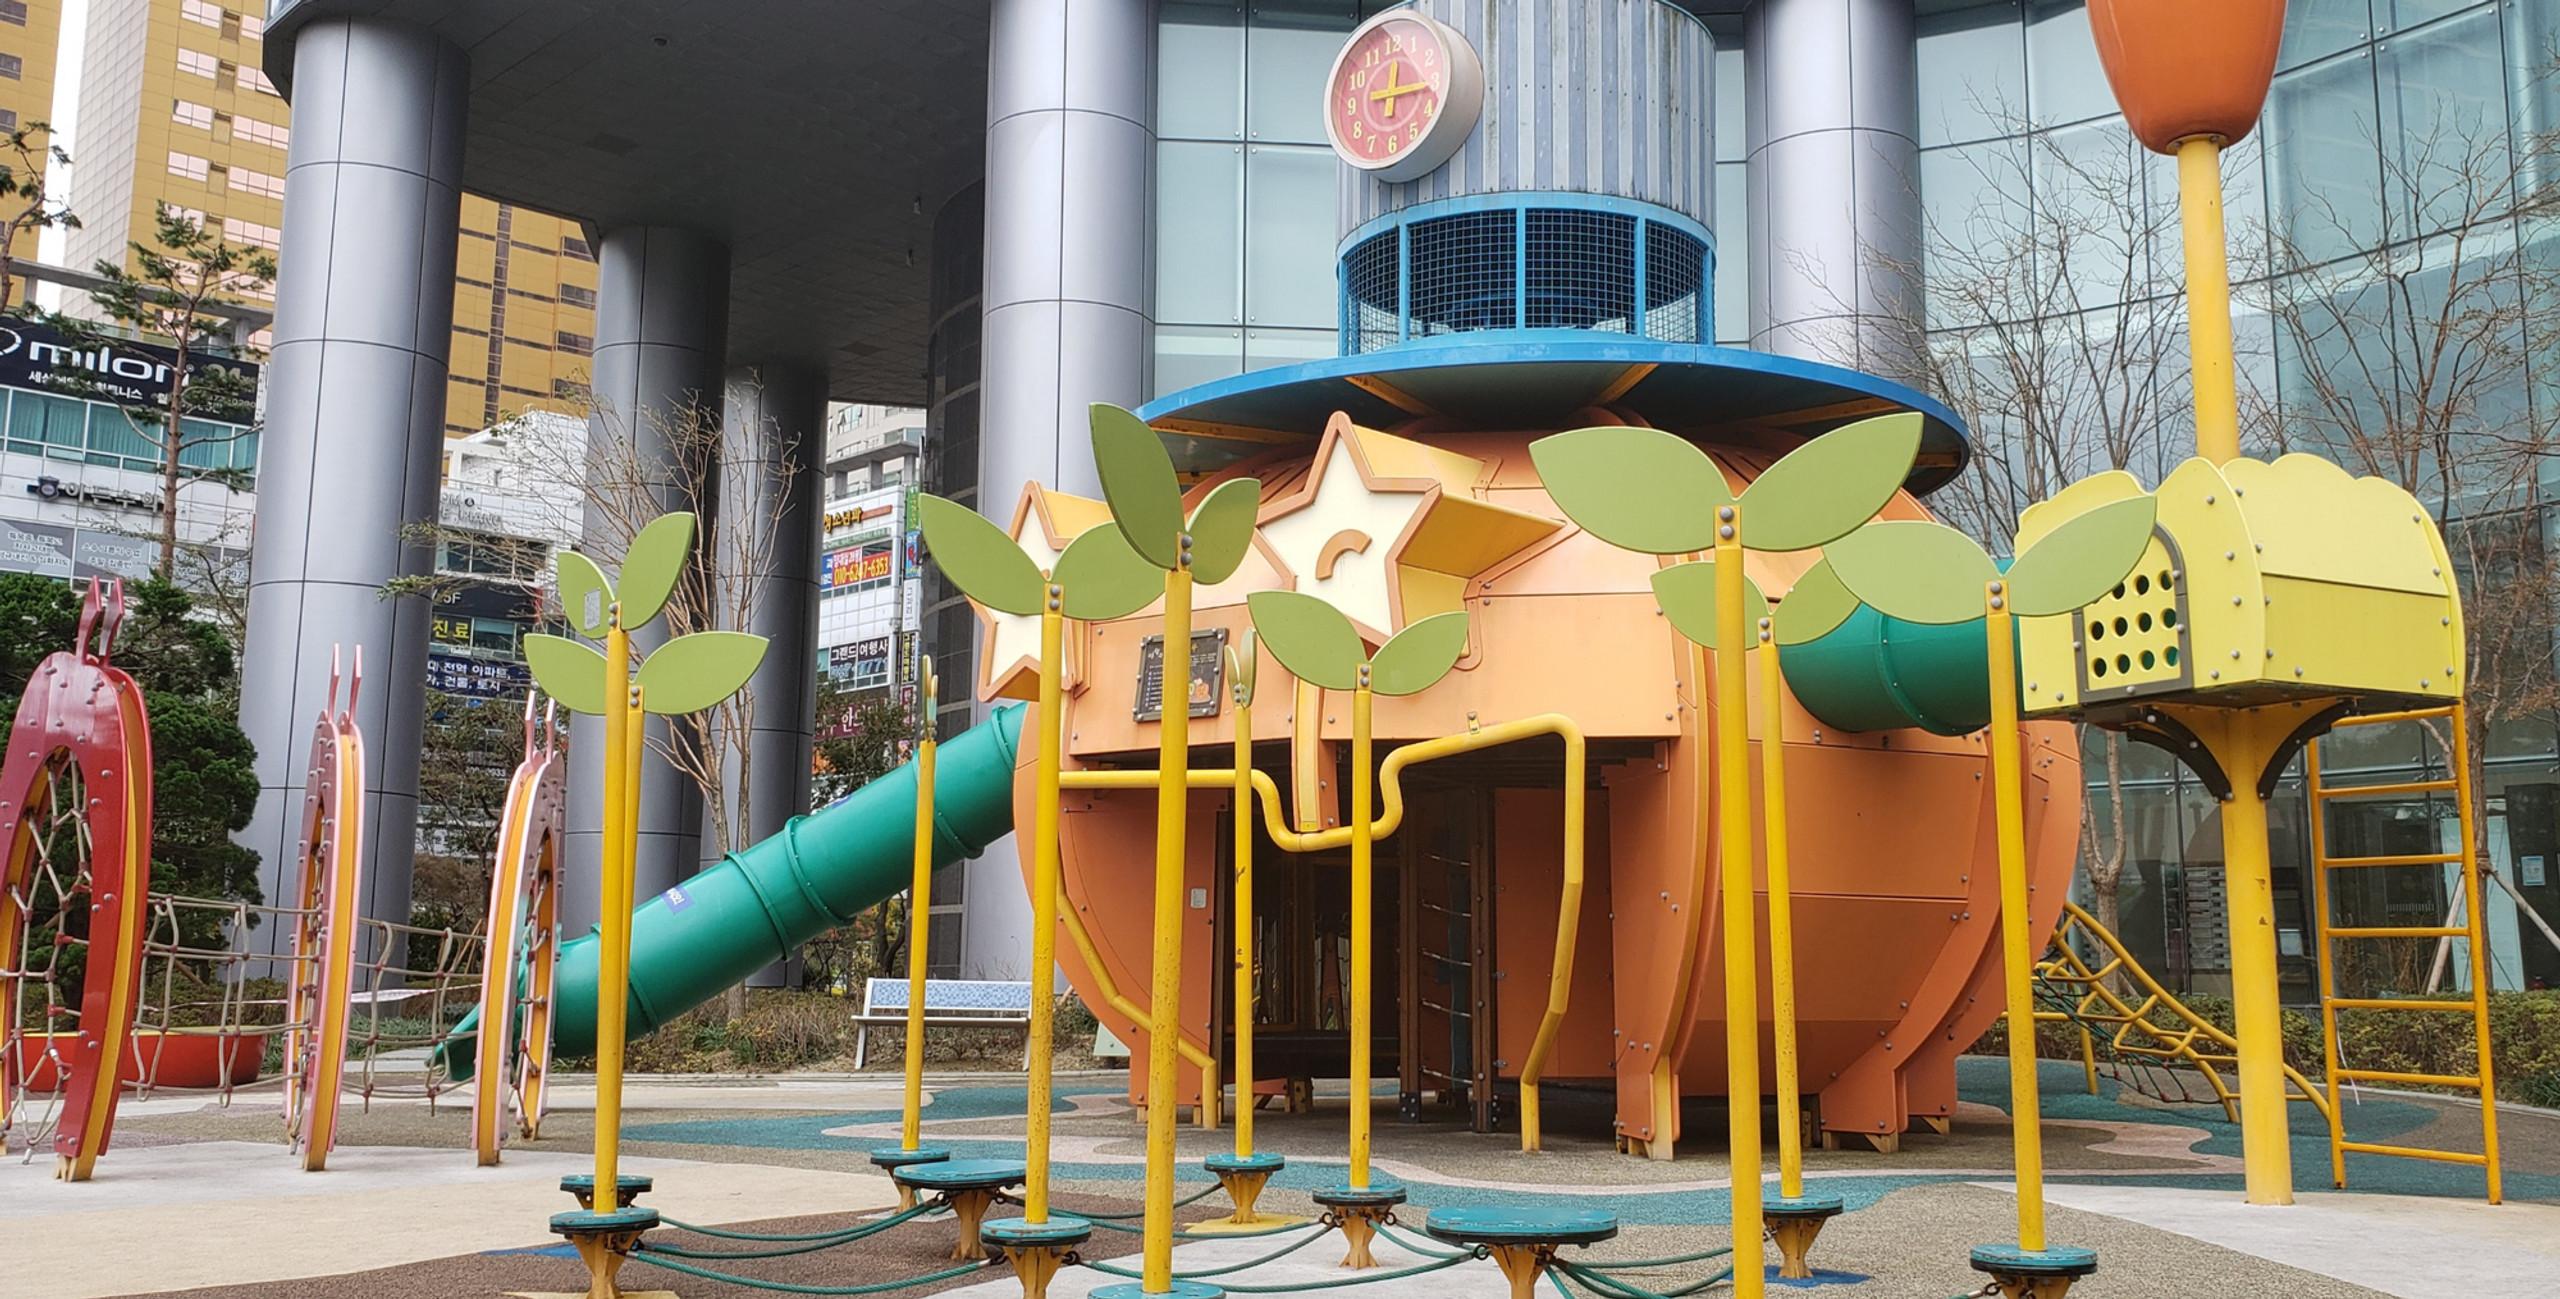 Fruit and veg themed playground